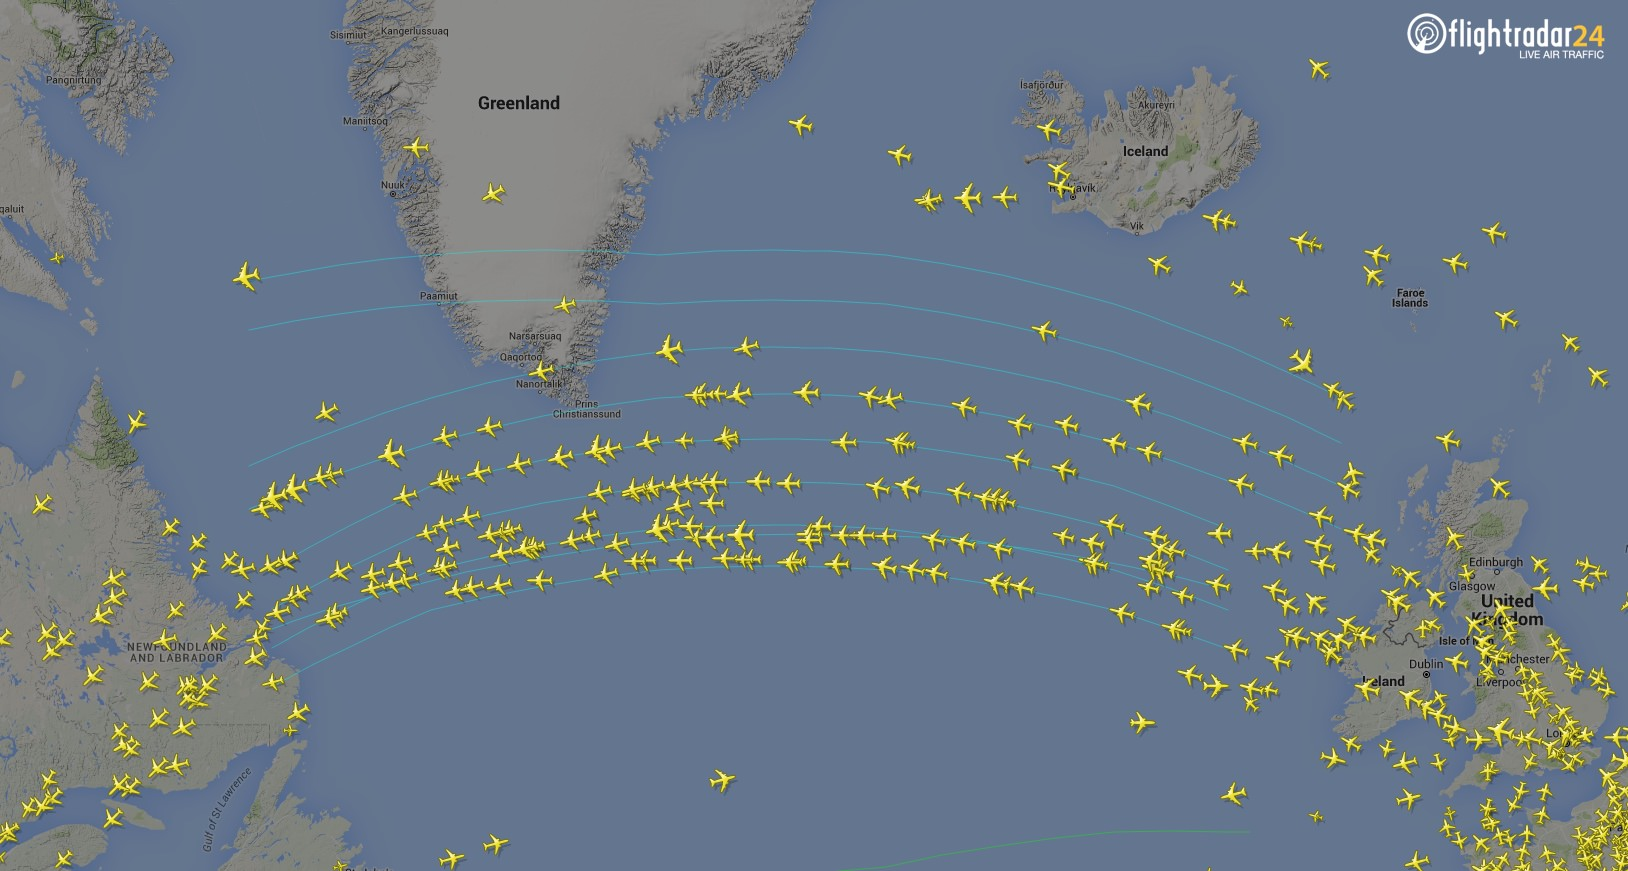 Flights traveling along the North Atlantic Tracks